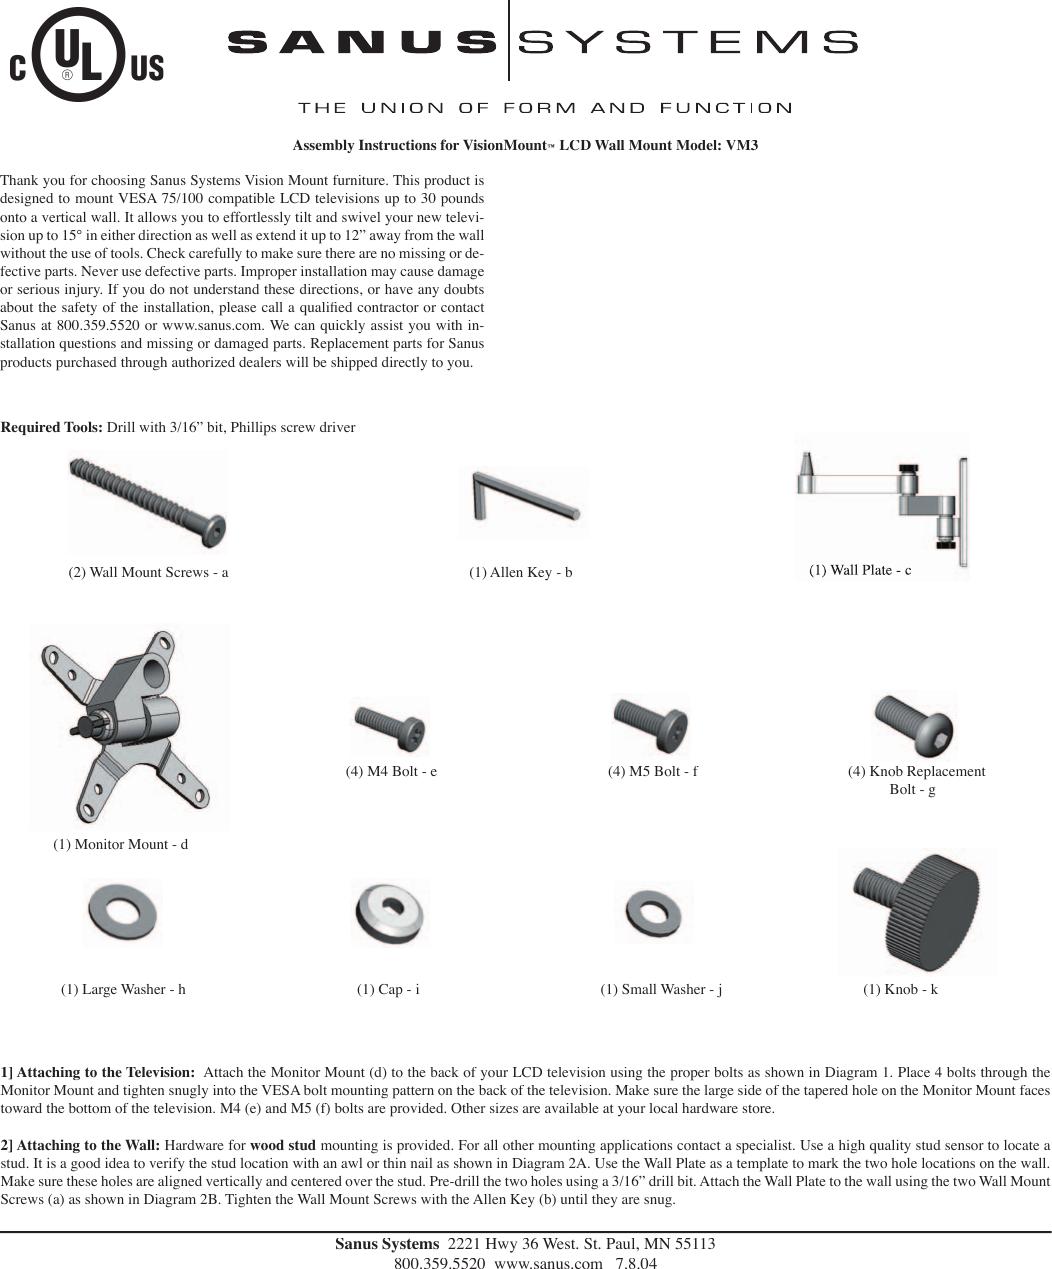 sanus systems visionmount lcd wall mount vm3 users manual rh usermanual wiki Sanus TV Mounts Sanus Wall Mount Installation